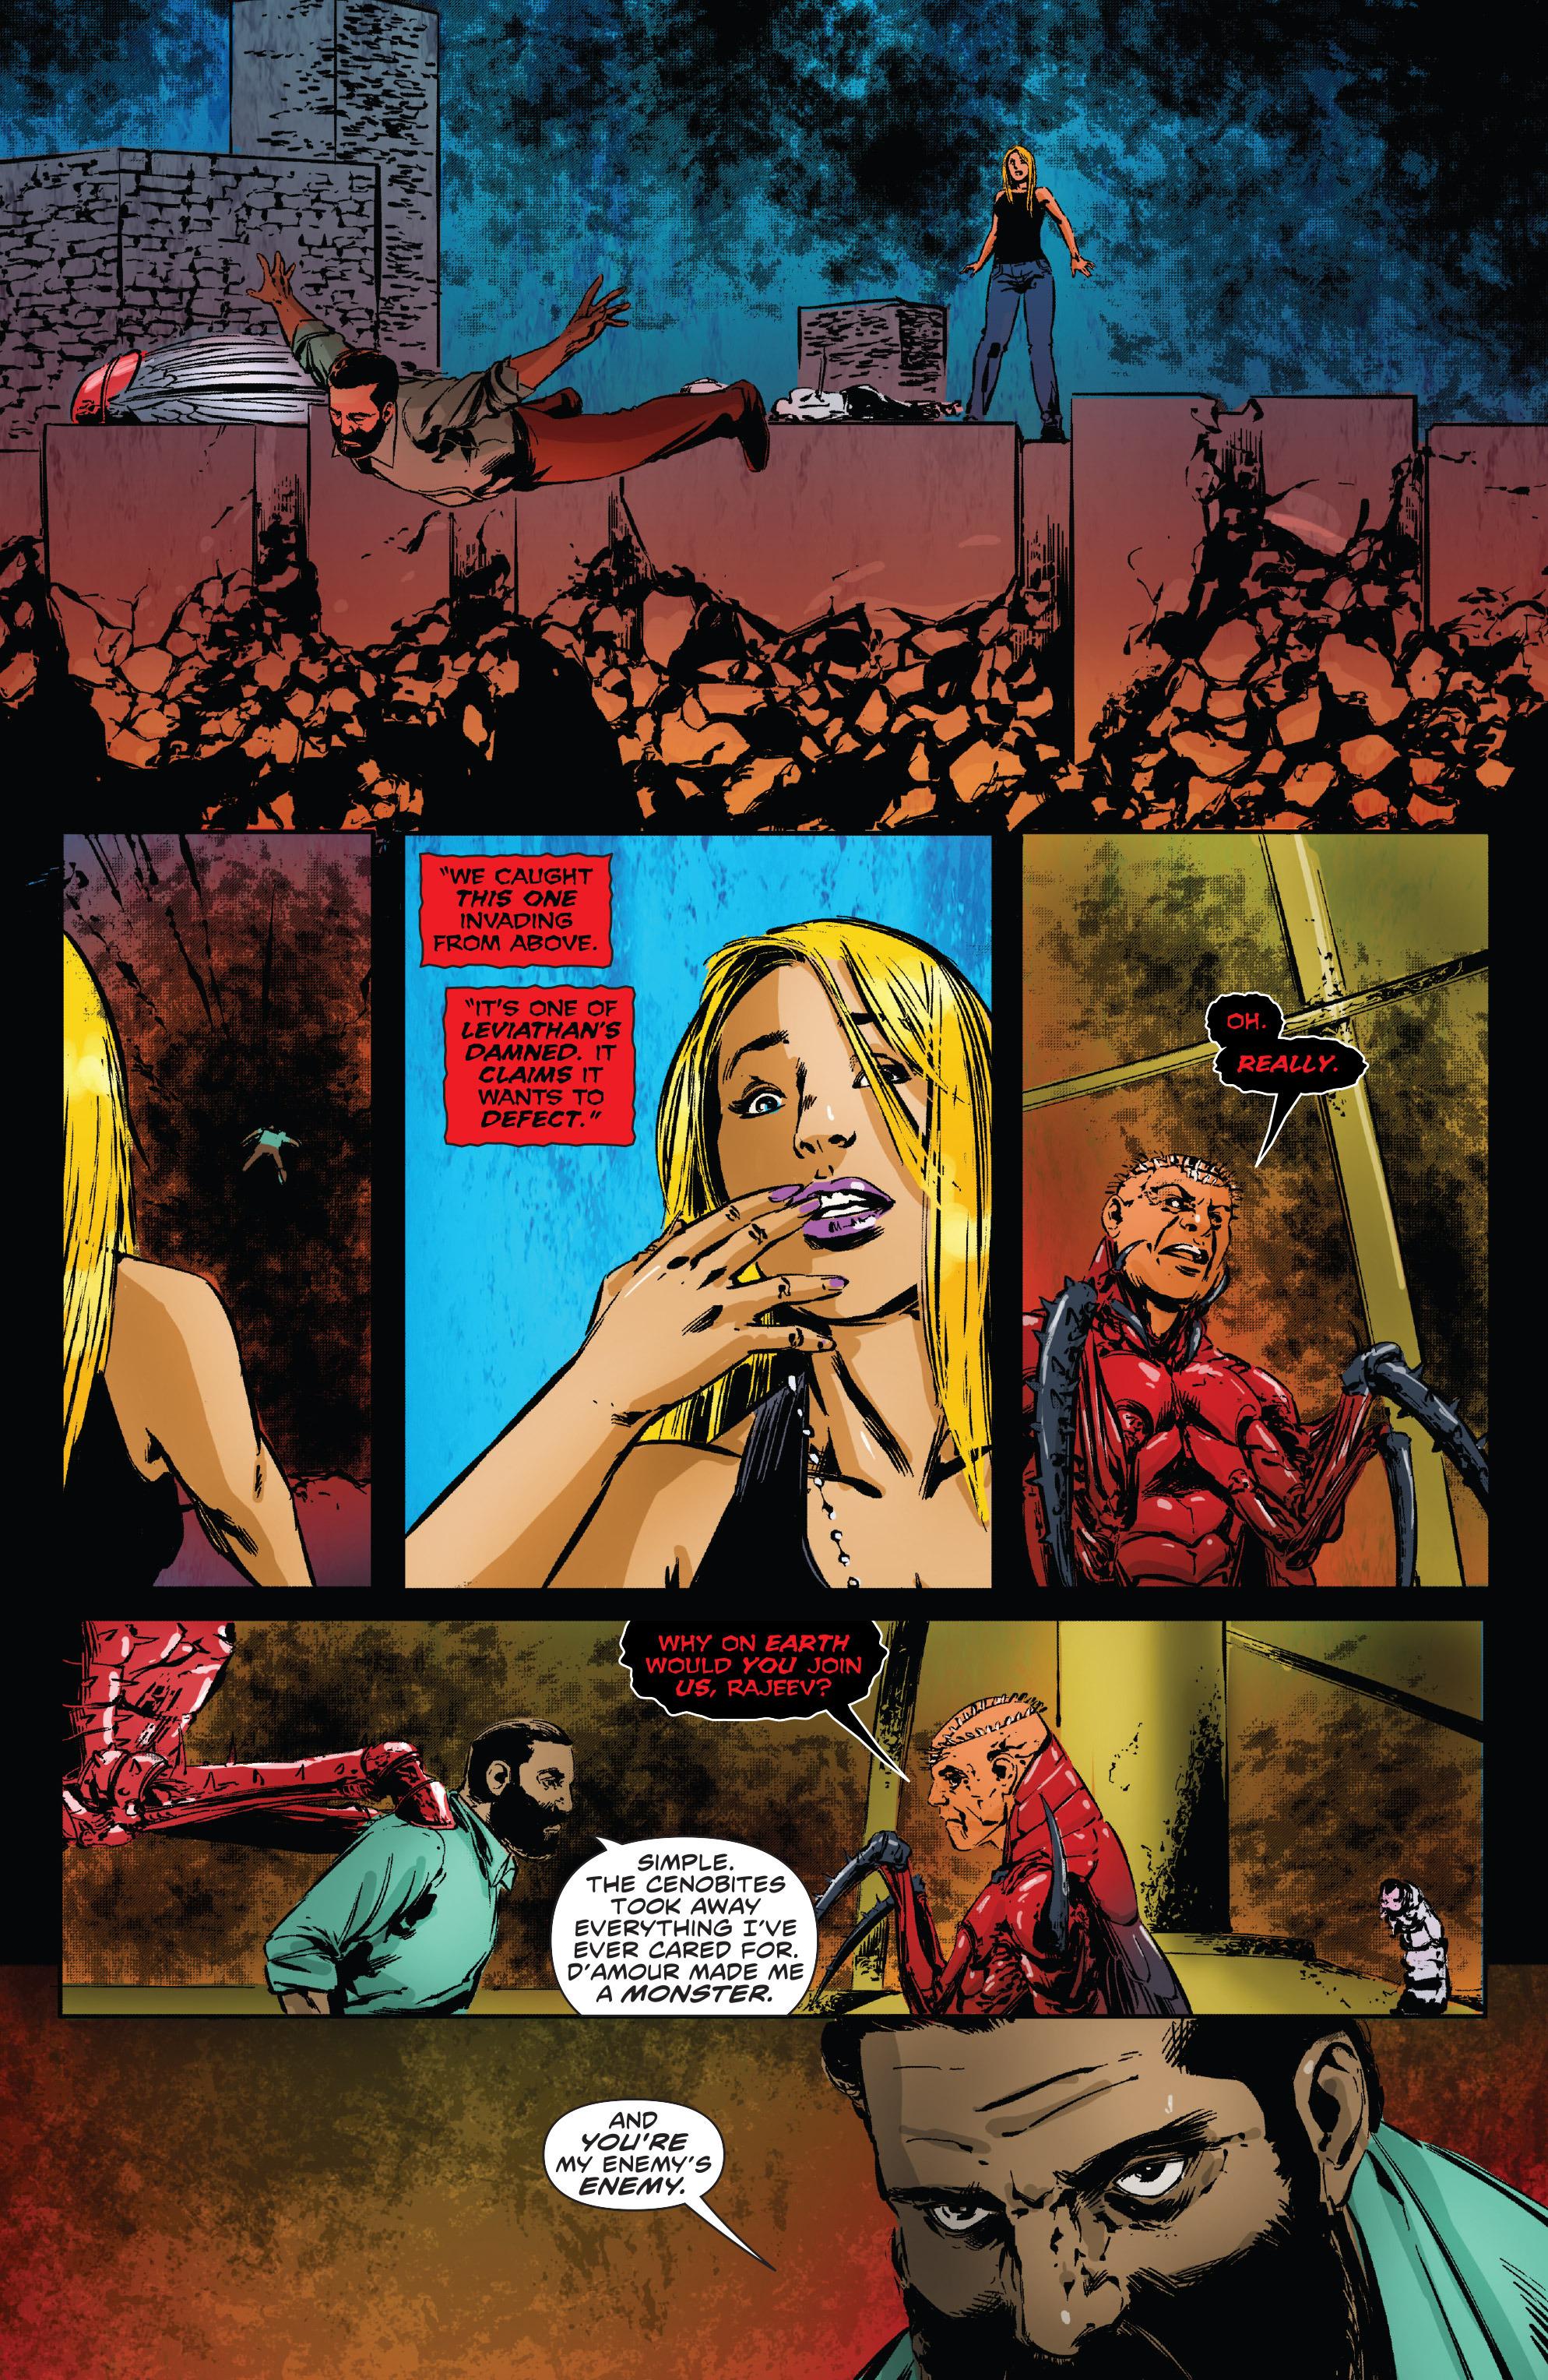 Read online Clive Barker's Hellraiser: The Dark Watch comic -  Issue # TPB 3 - 57